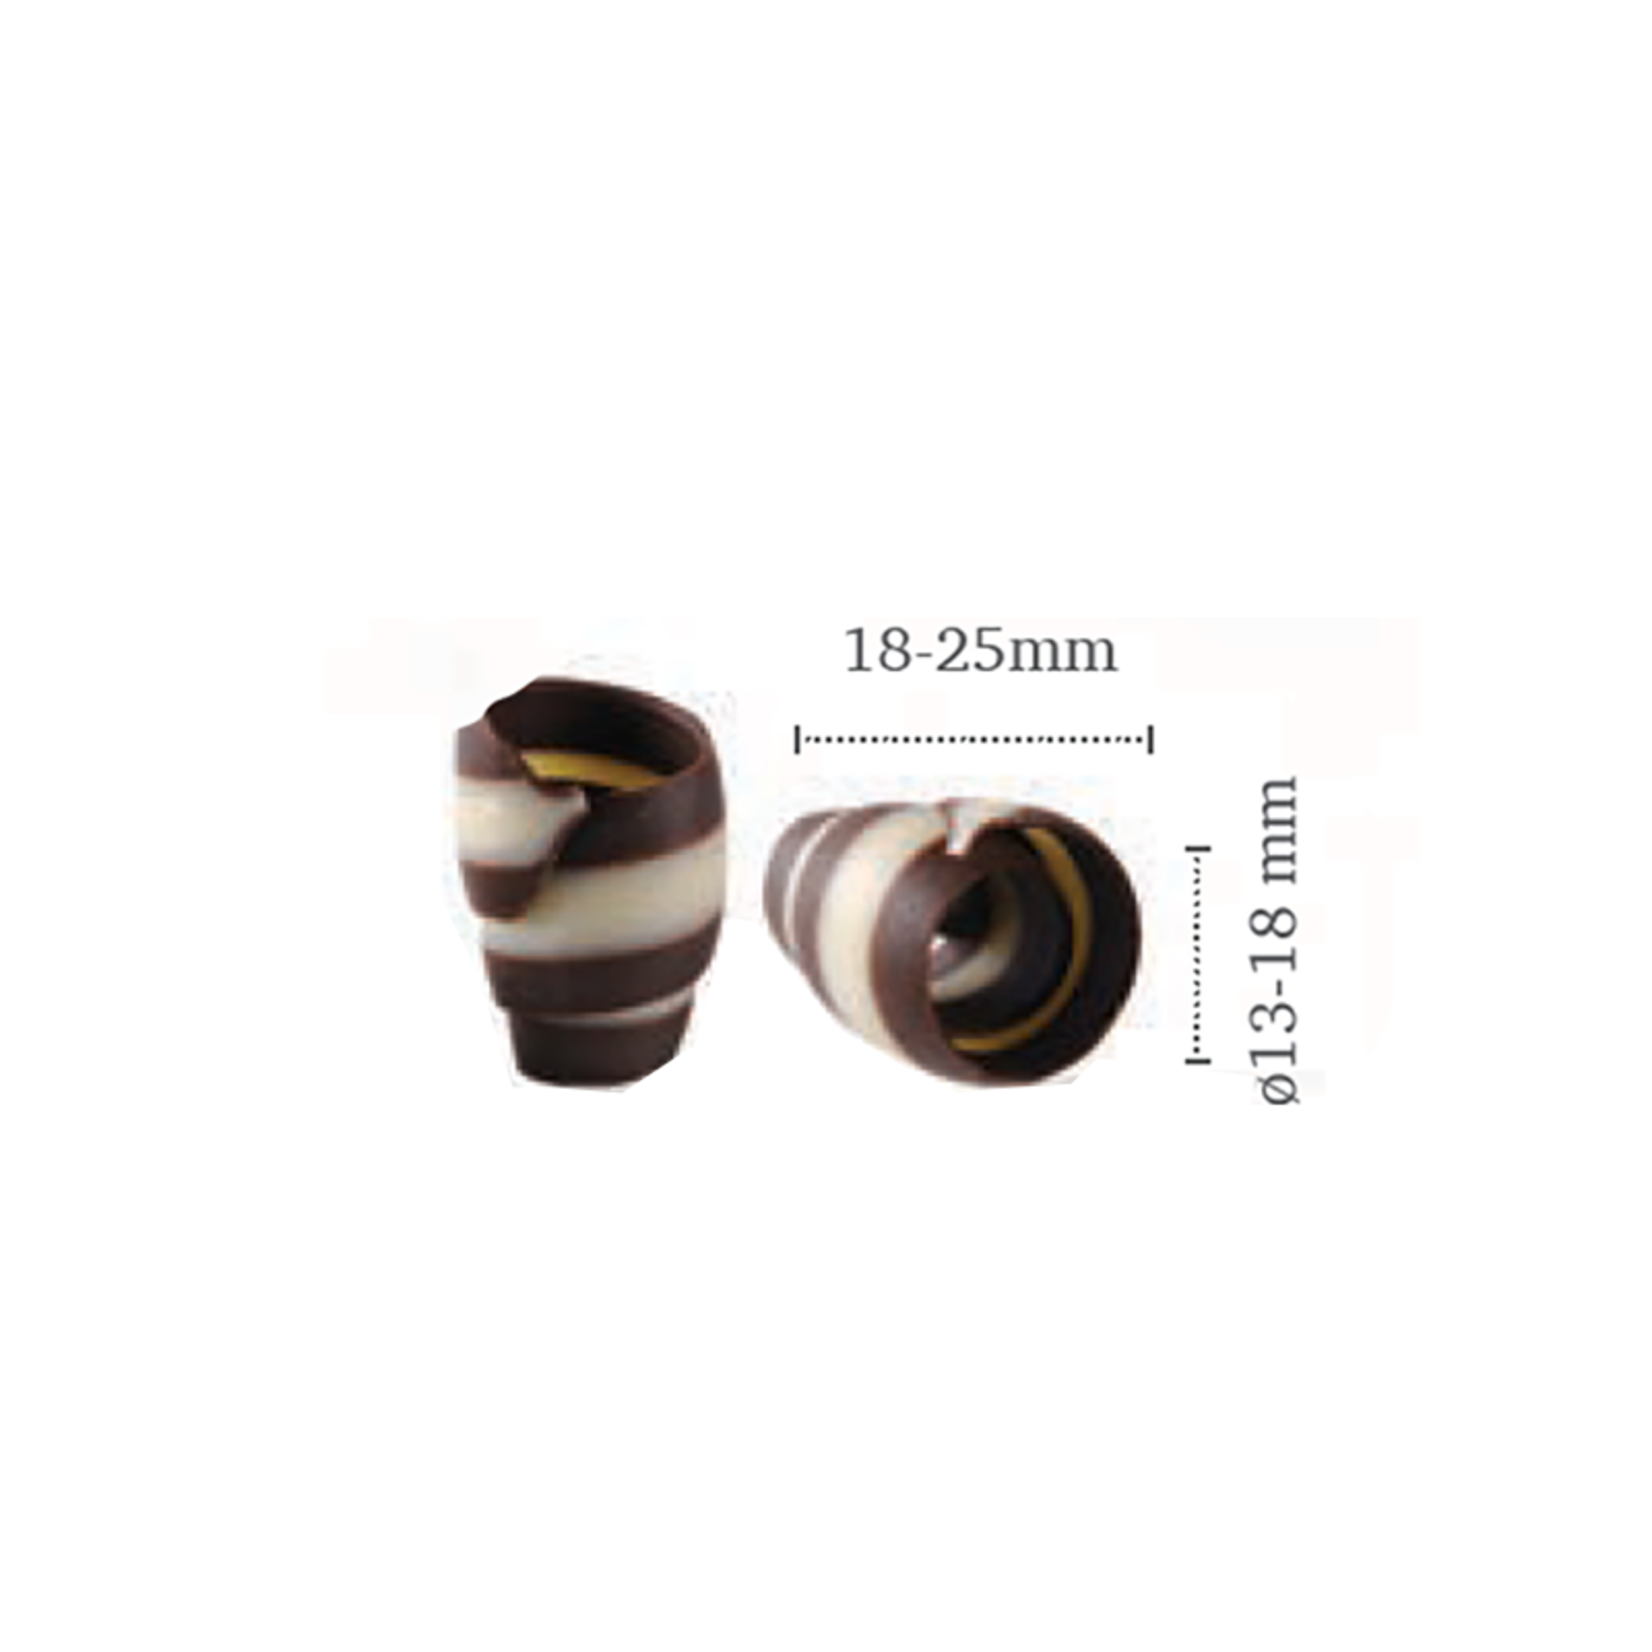 Dobla Dobla - Chocolate Rose Curl, Dark/White (180ct), 72183